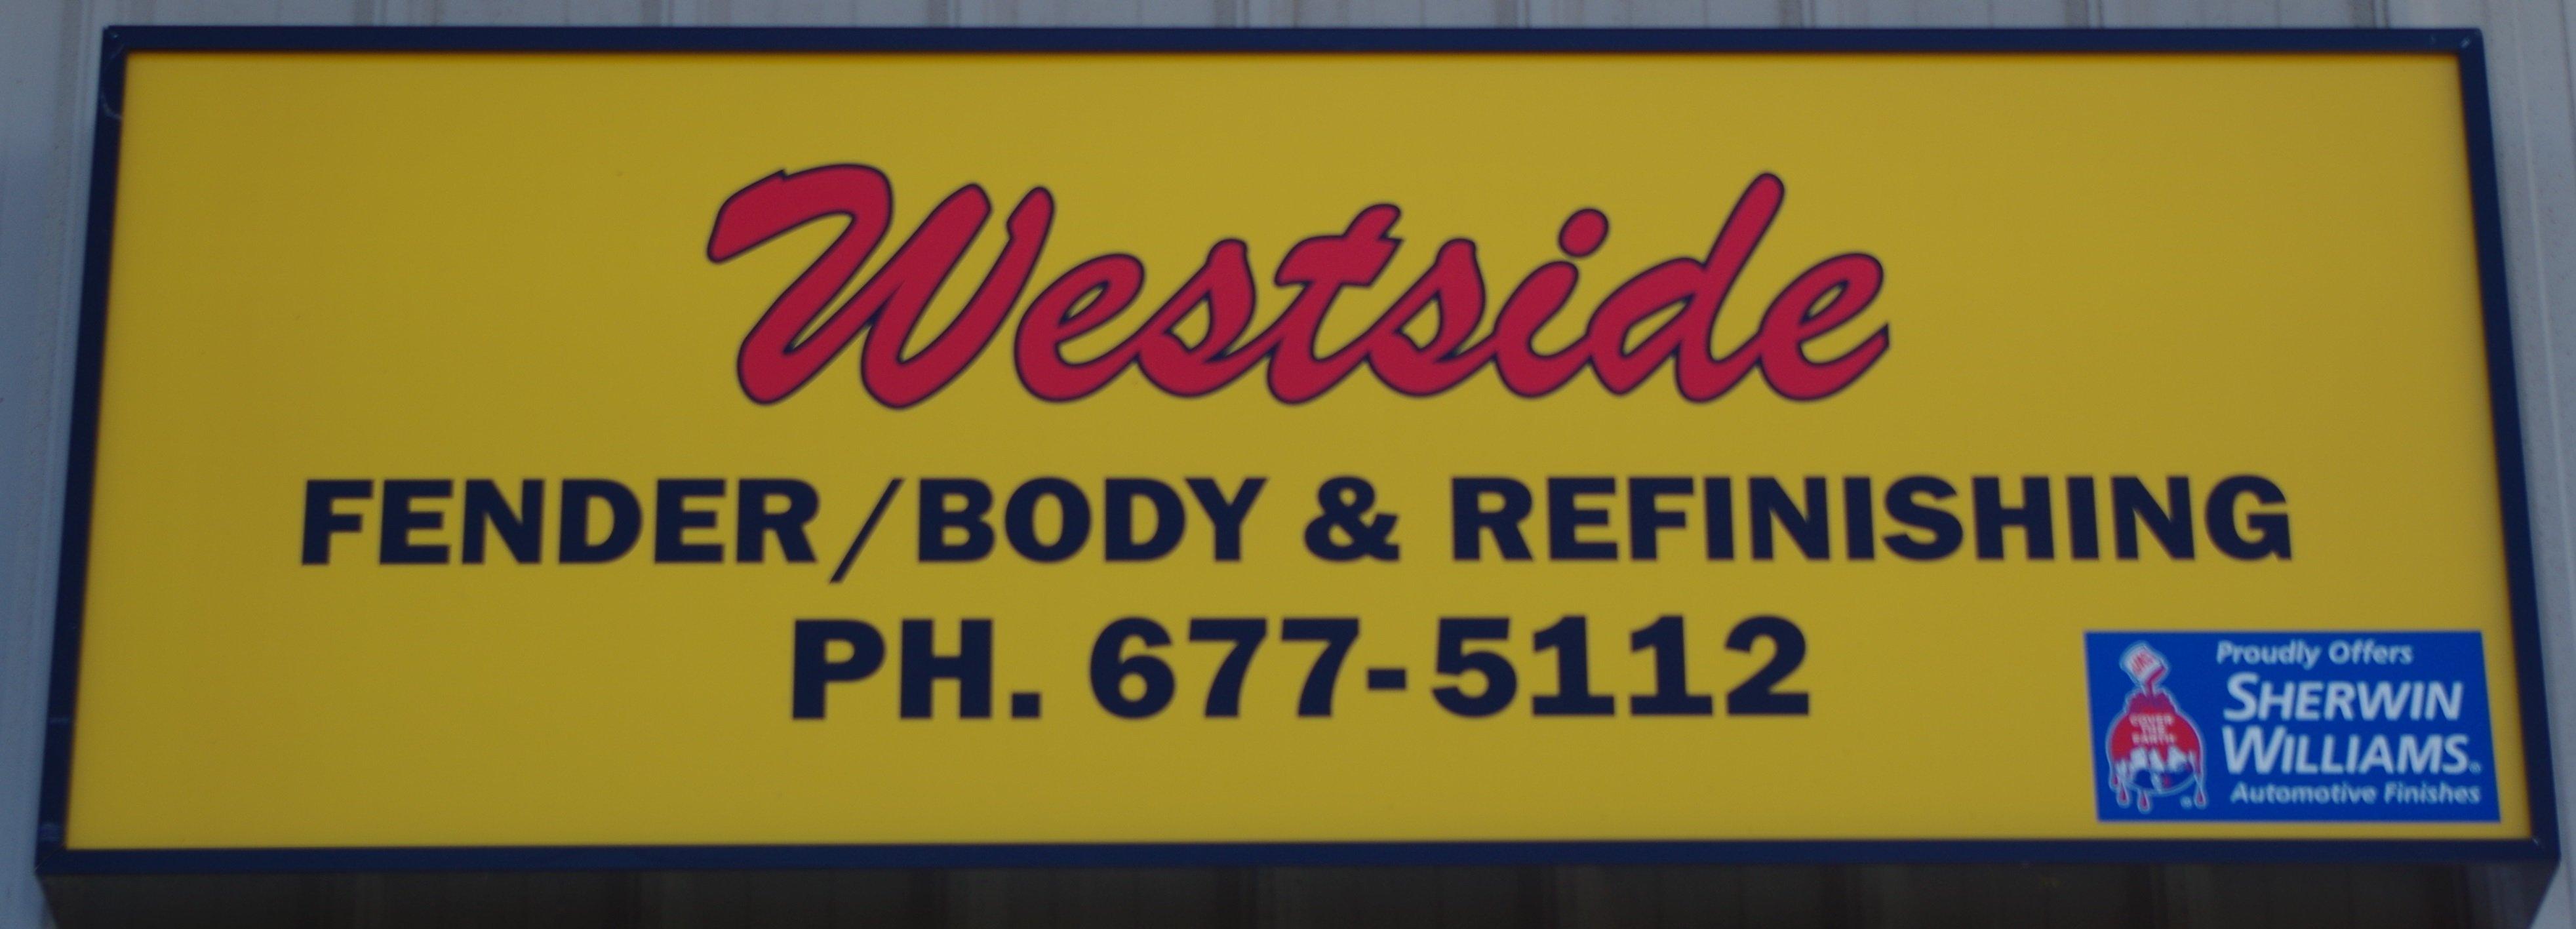 Westside Fender/Body & Refinishing